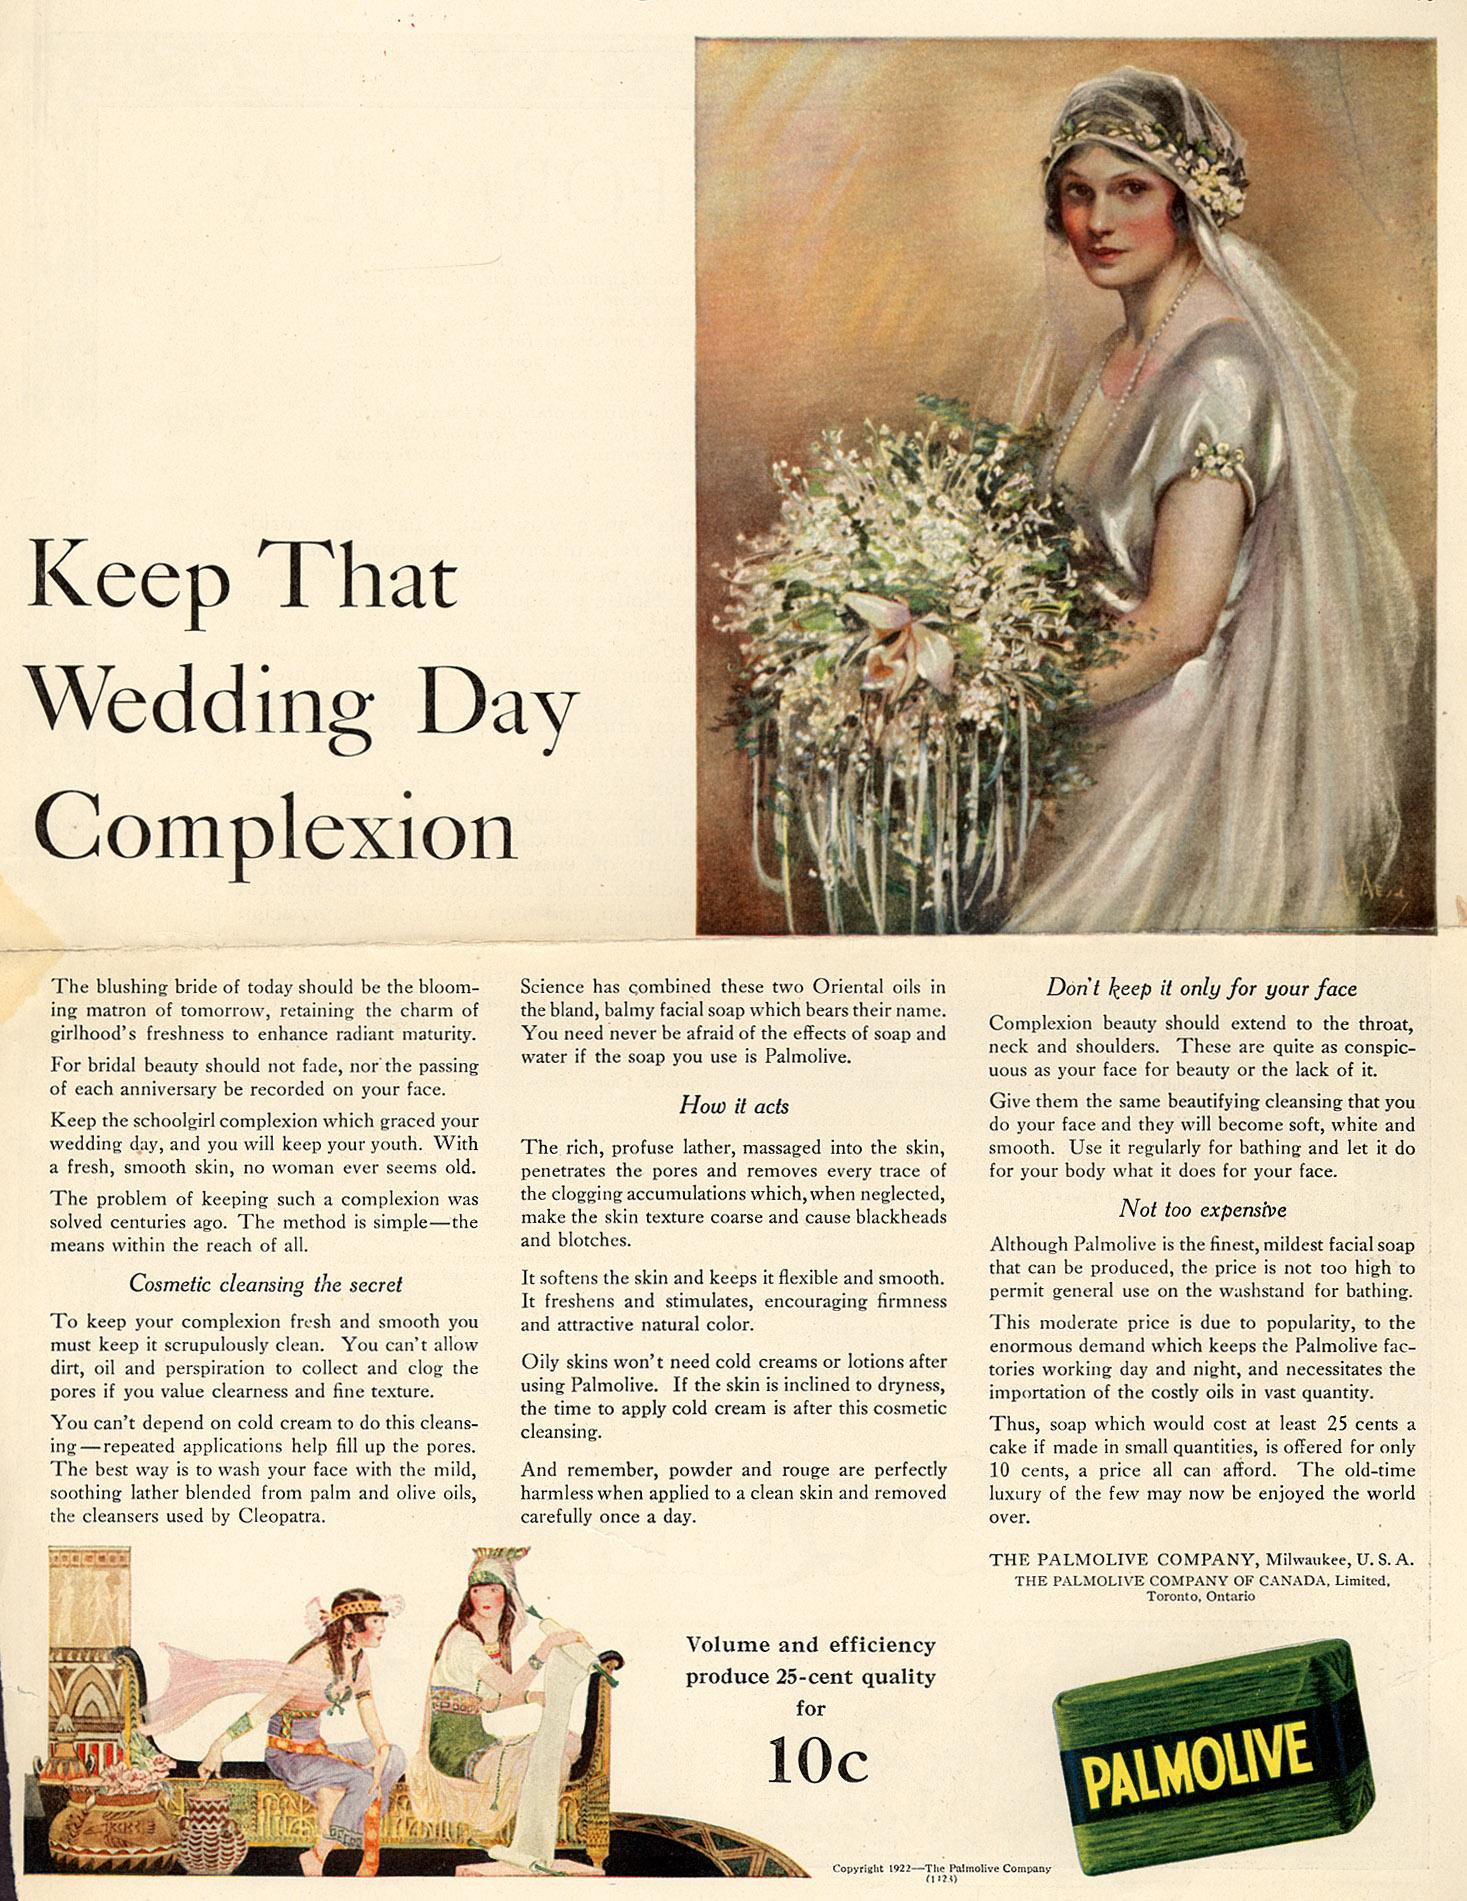 1922magazineadvertisementforolgate-almolivealmoliveoap